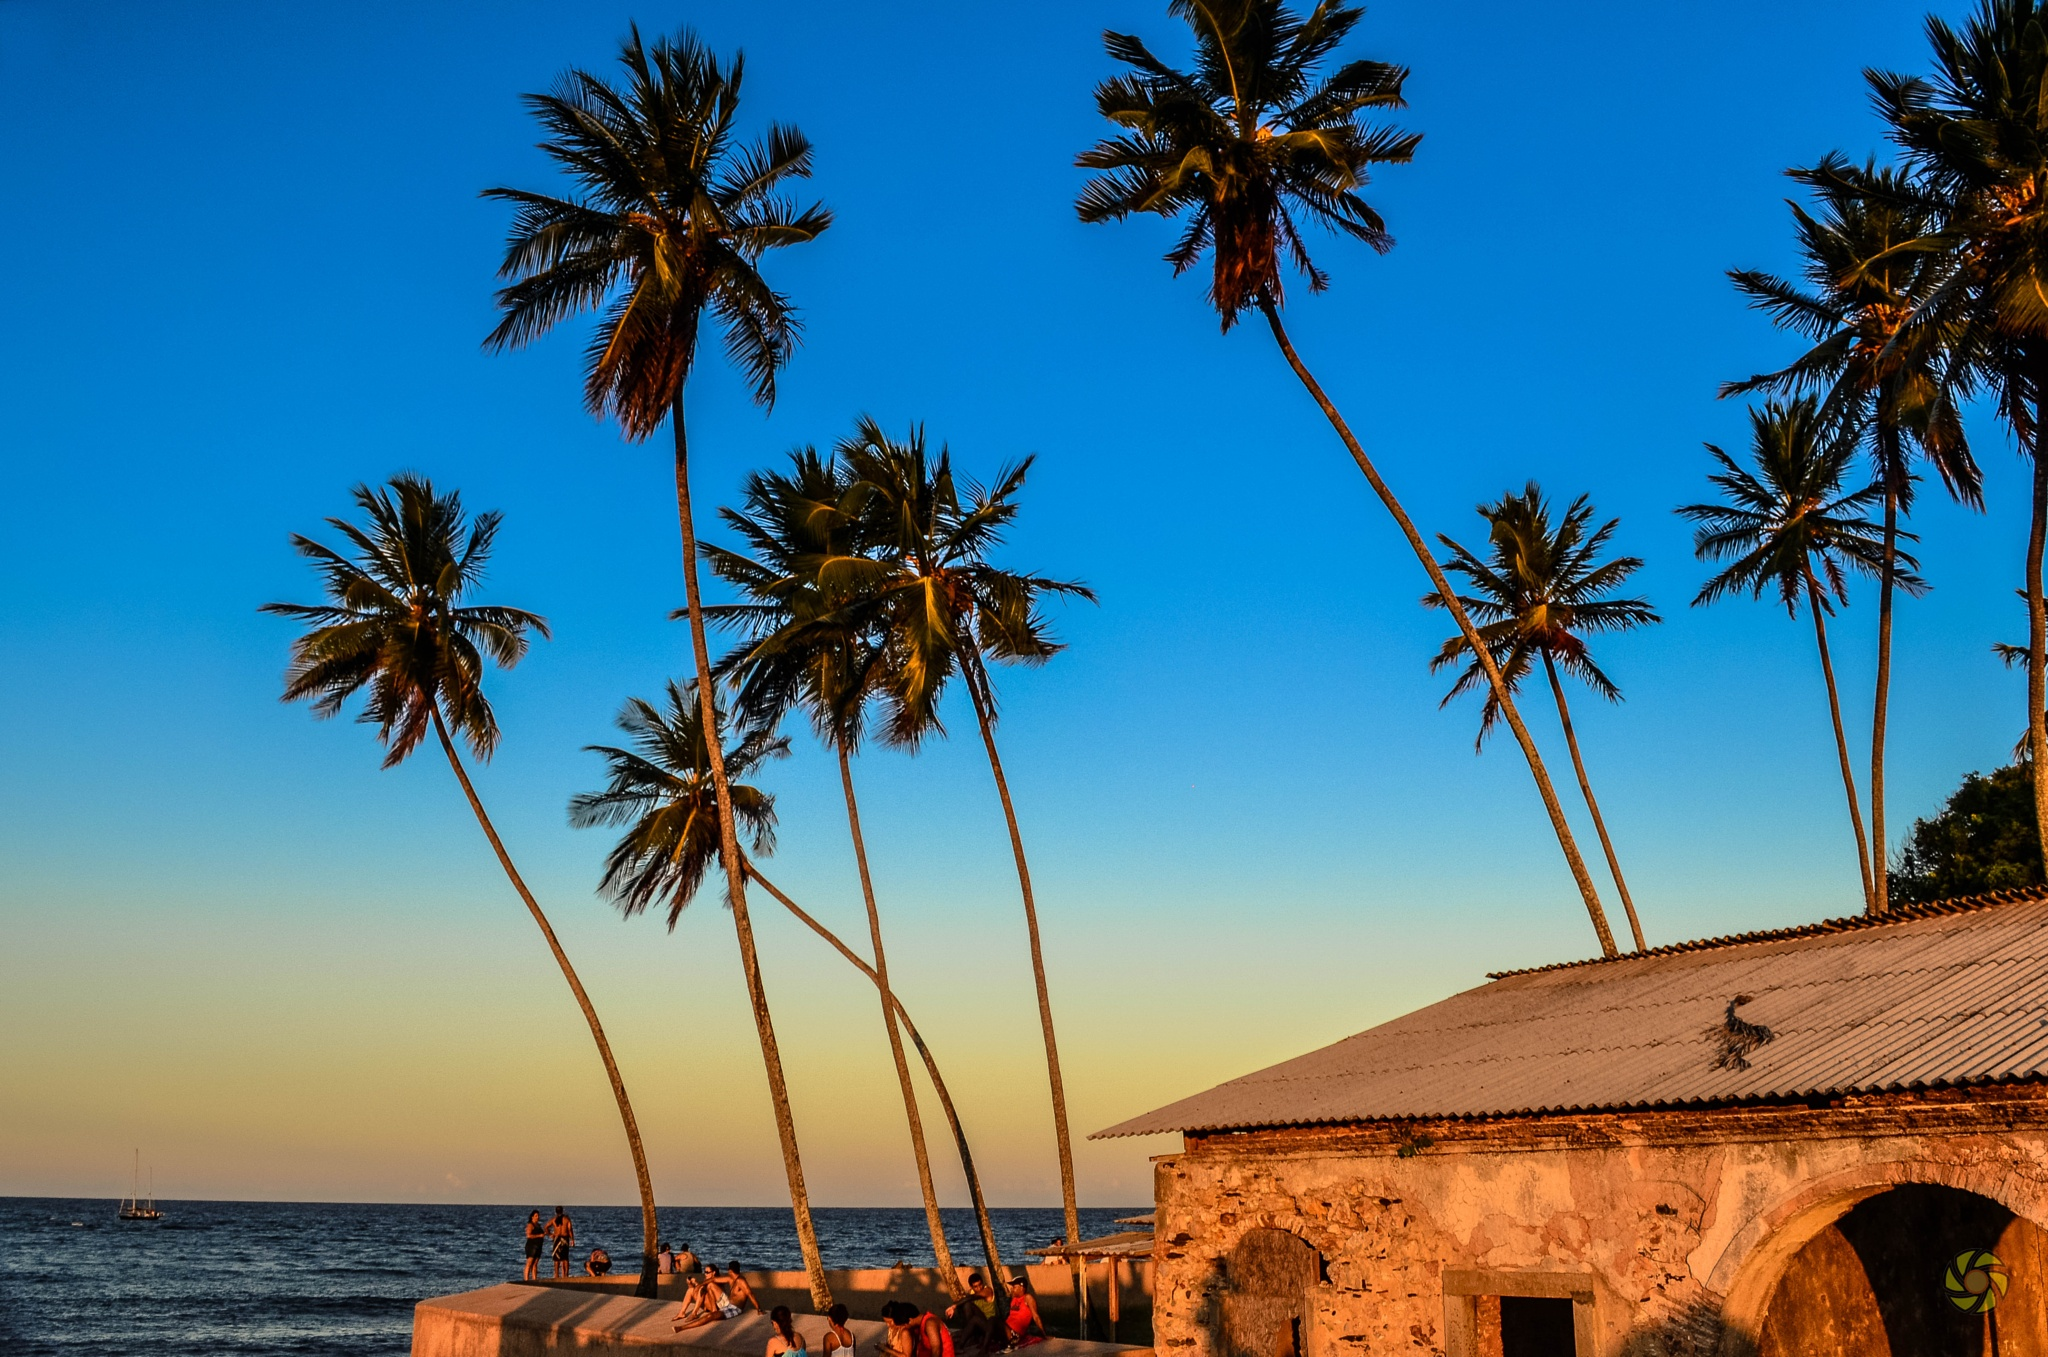 Coconut Trees by Weigler Godoy